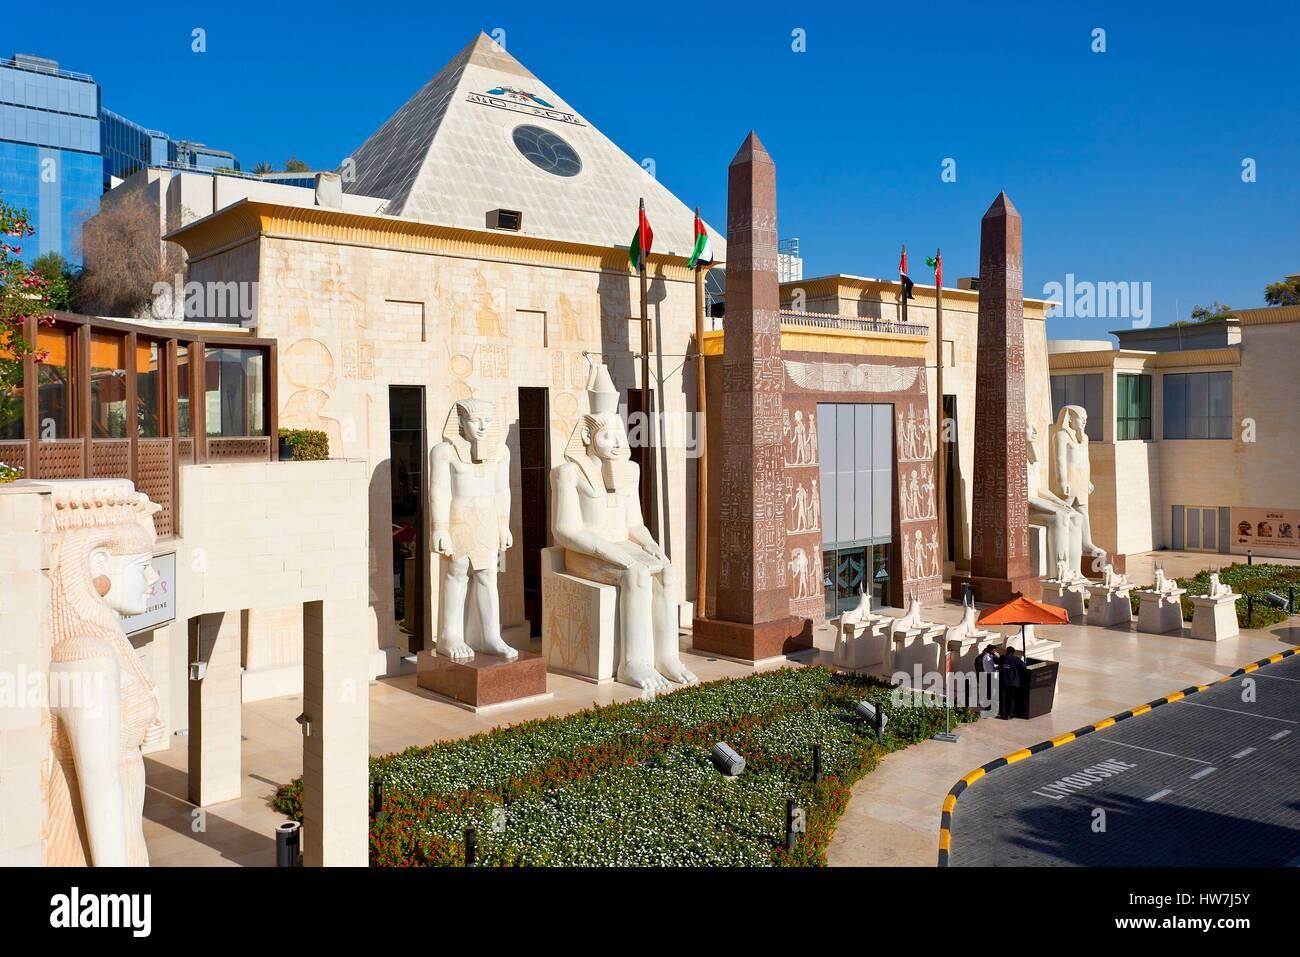 United Arab Emirates, Dubai, Wafi city Mall - Stock Image